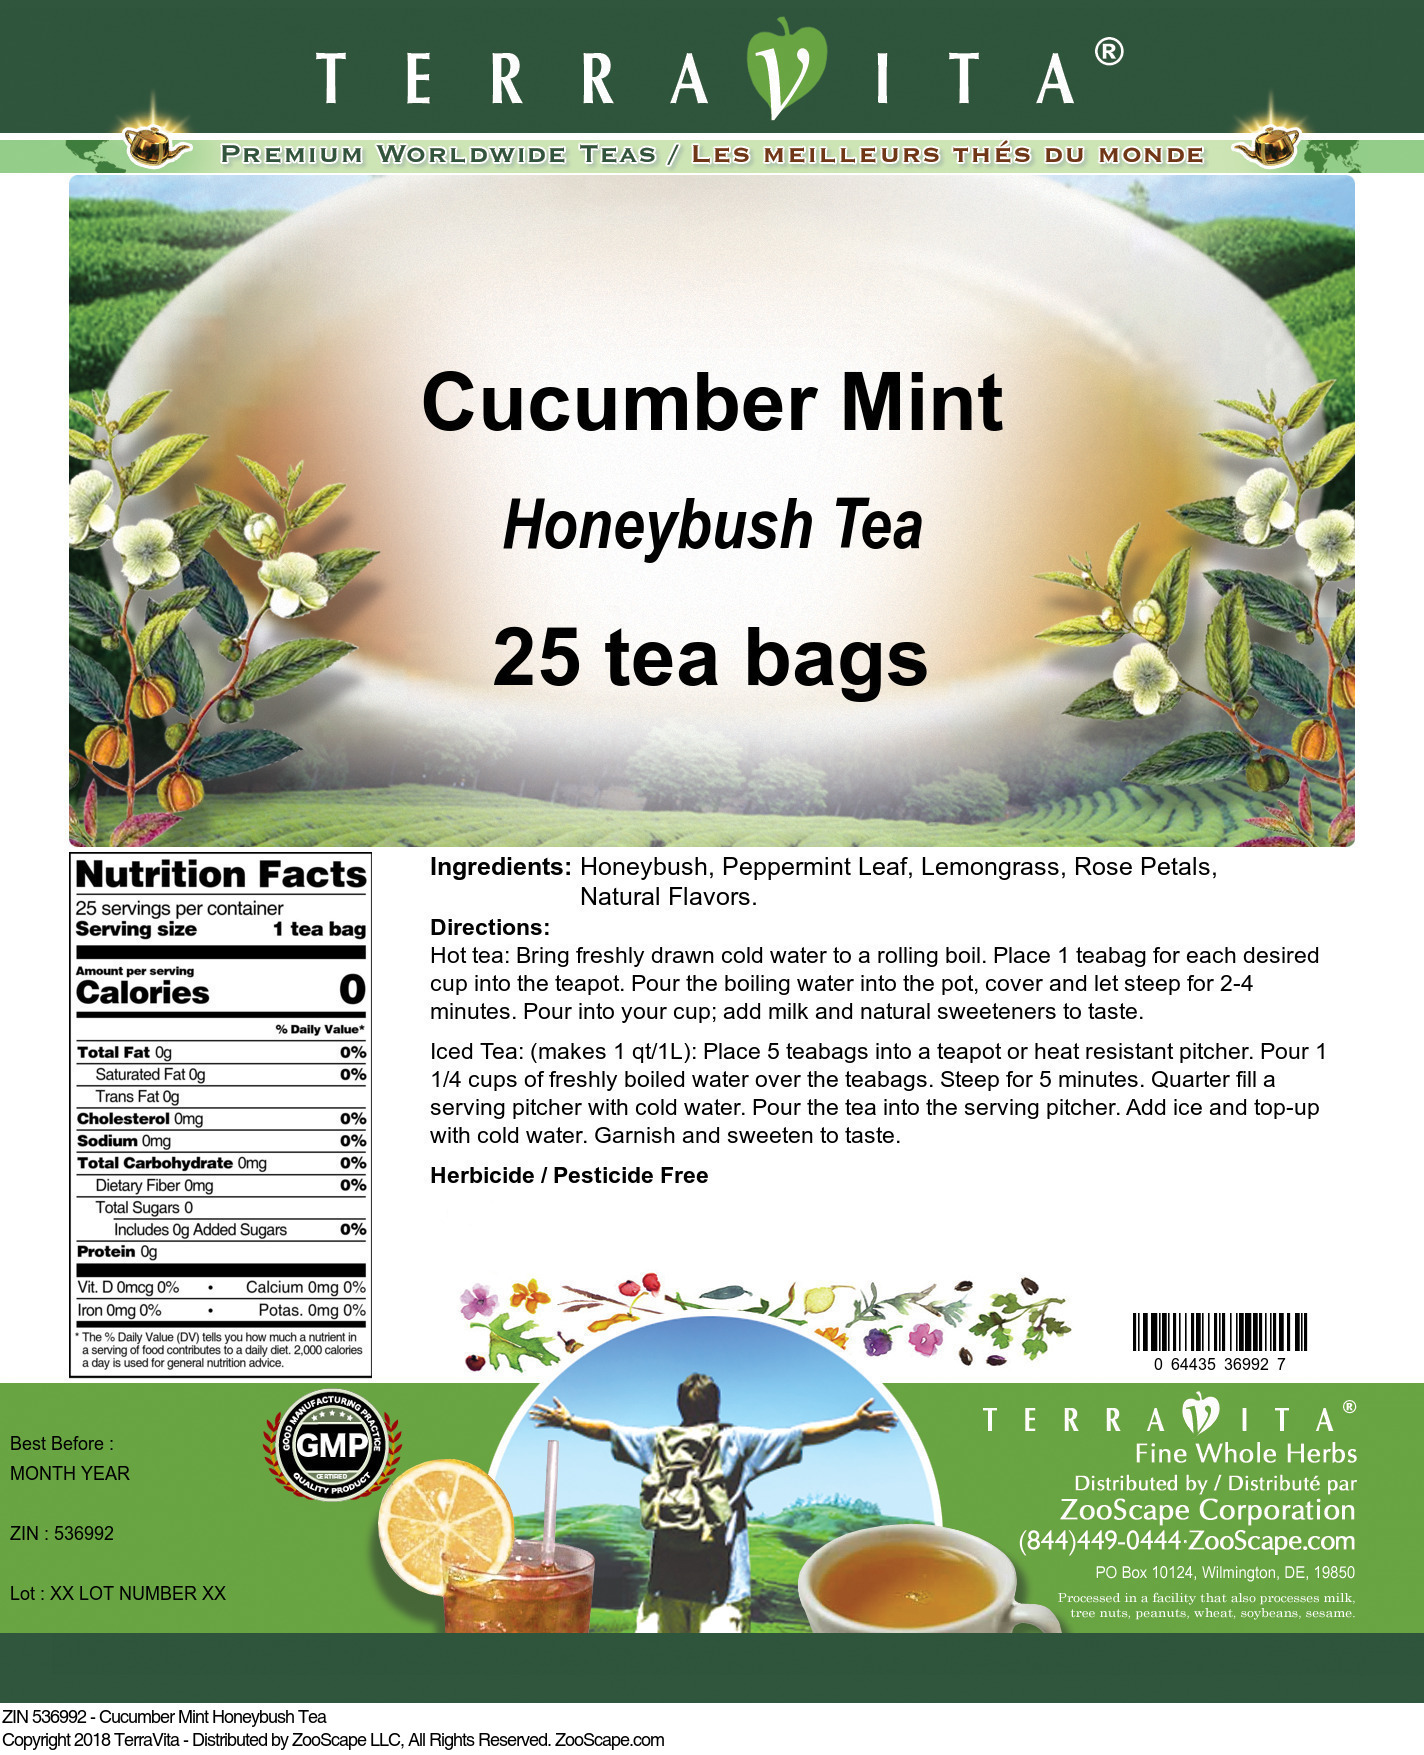 Cucumber Mint Honeybush Tea